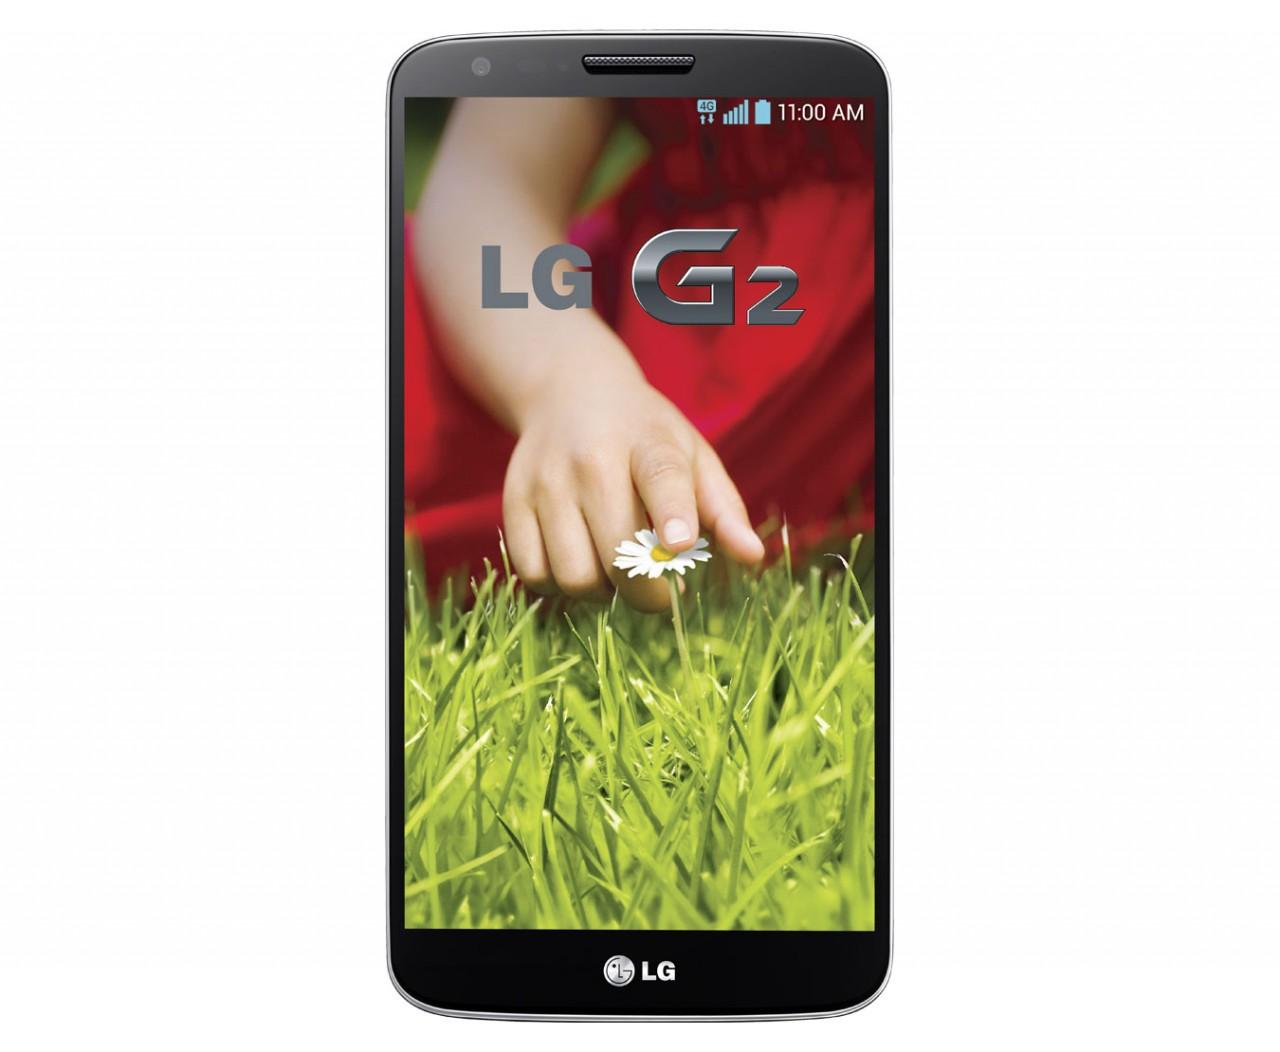 LG G2 - D805 (3G - 16GB) Black